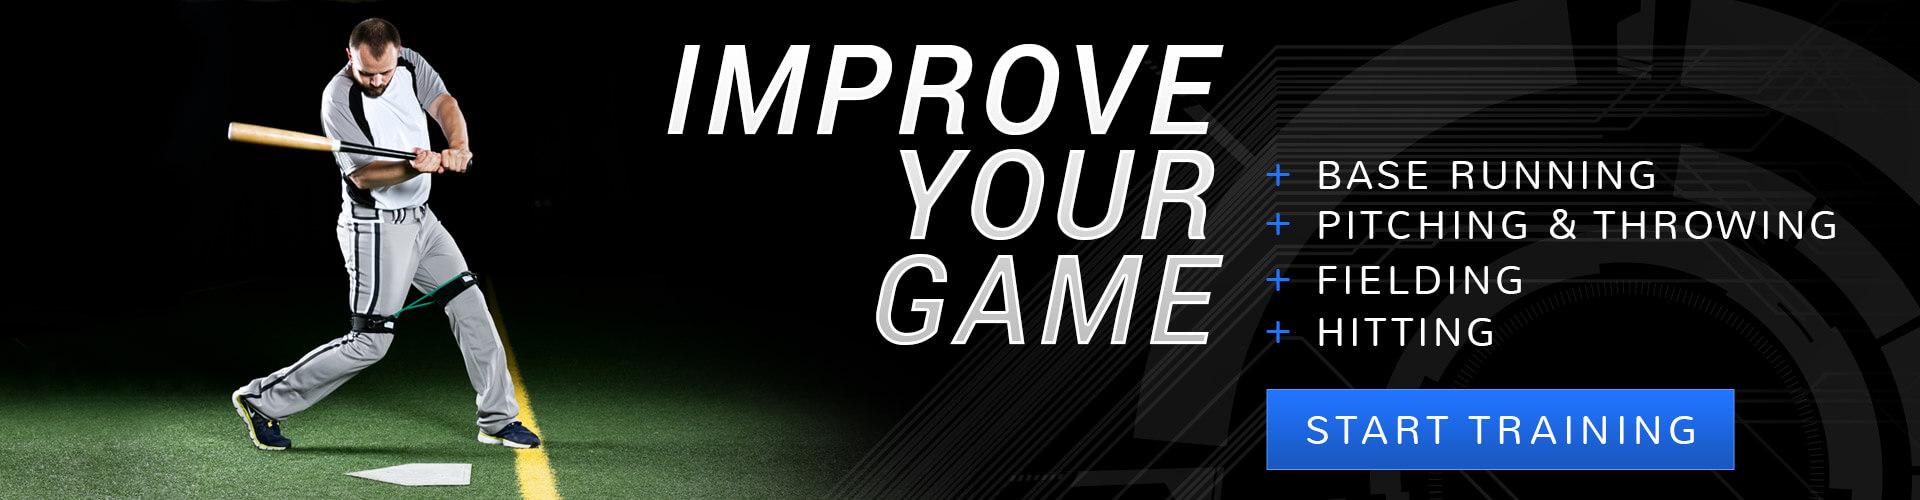 Improve Your Game in Baseball: +Base Running +Pitching & Throwing +Fielding +Hitting - Start Training